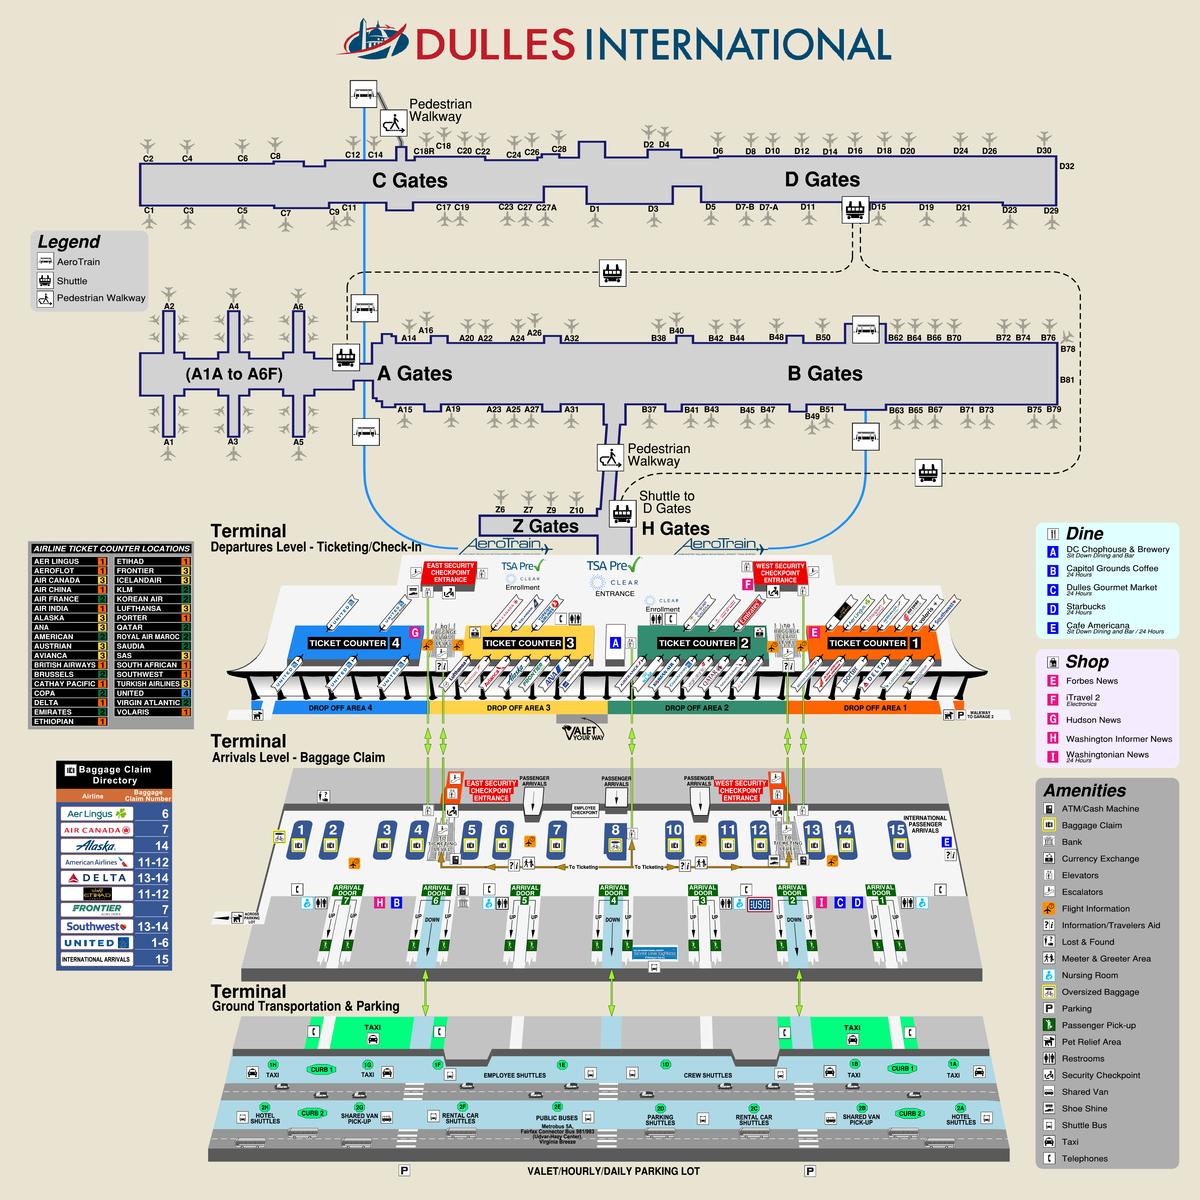 Dulles Airport Terminal Map IAD Airport and Terminal Map | Paris | Map, Diagram, Paris